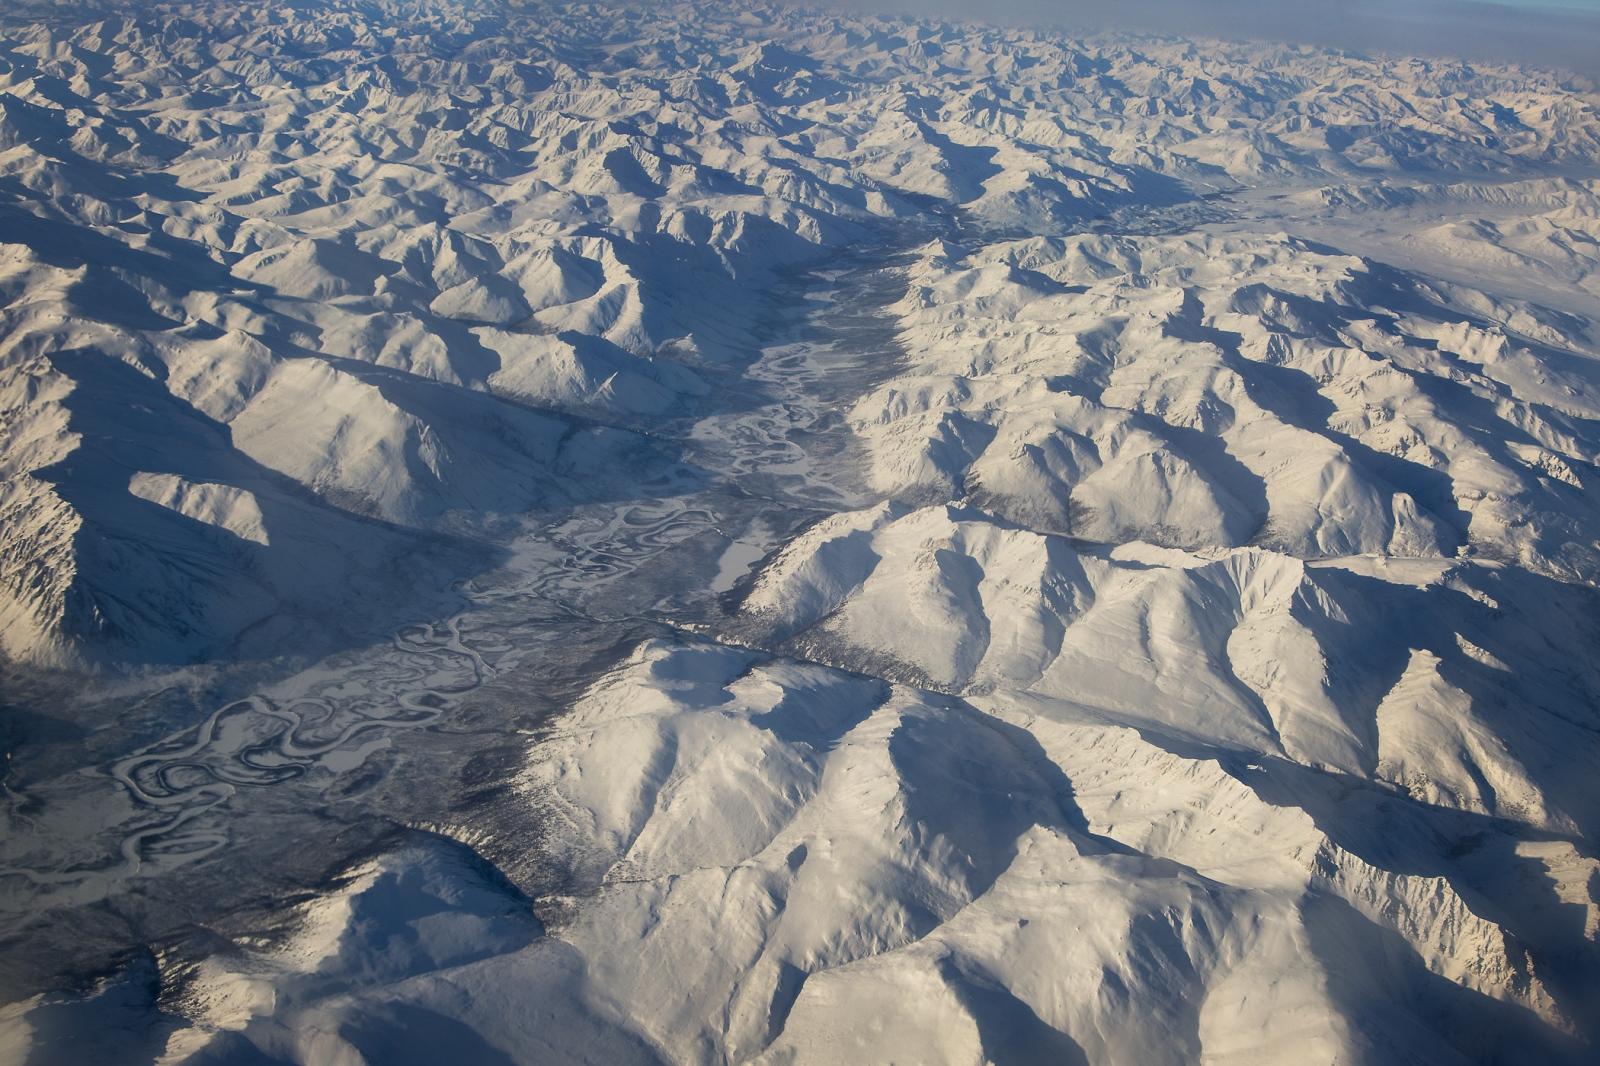 Art and Documentary Photography - Loading 2_Crossing_the_Brooks_Range_and_the_Arctic_National_Wildlife_Refuge_late_February_2017_enroute_to_Kaktovik_.jpg